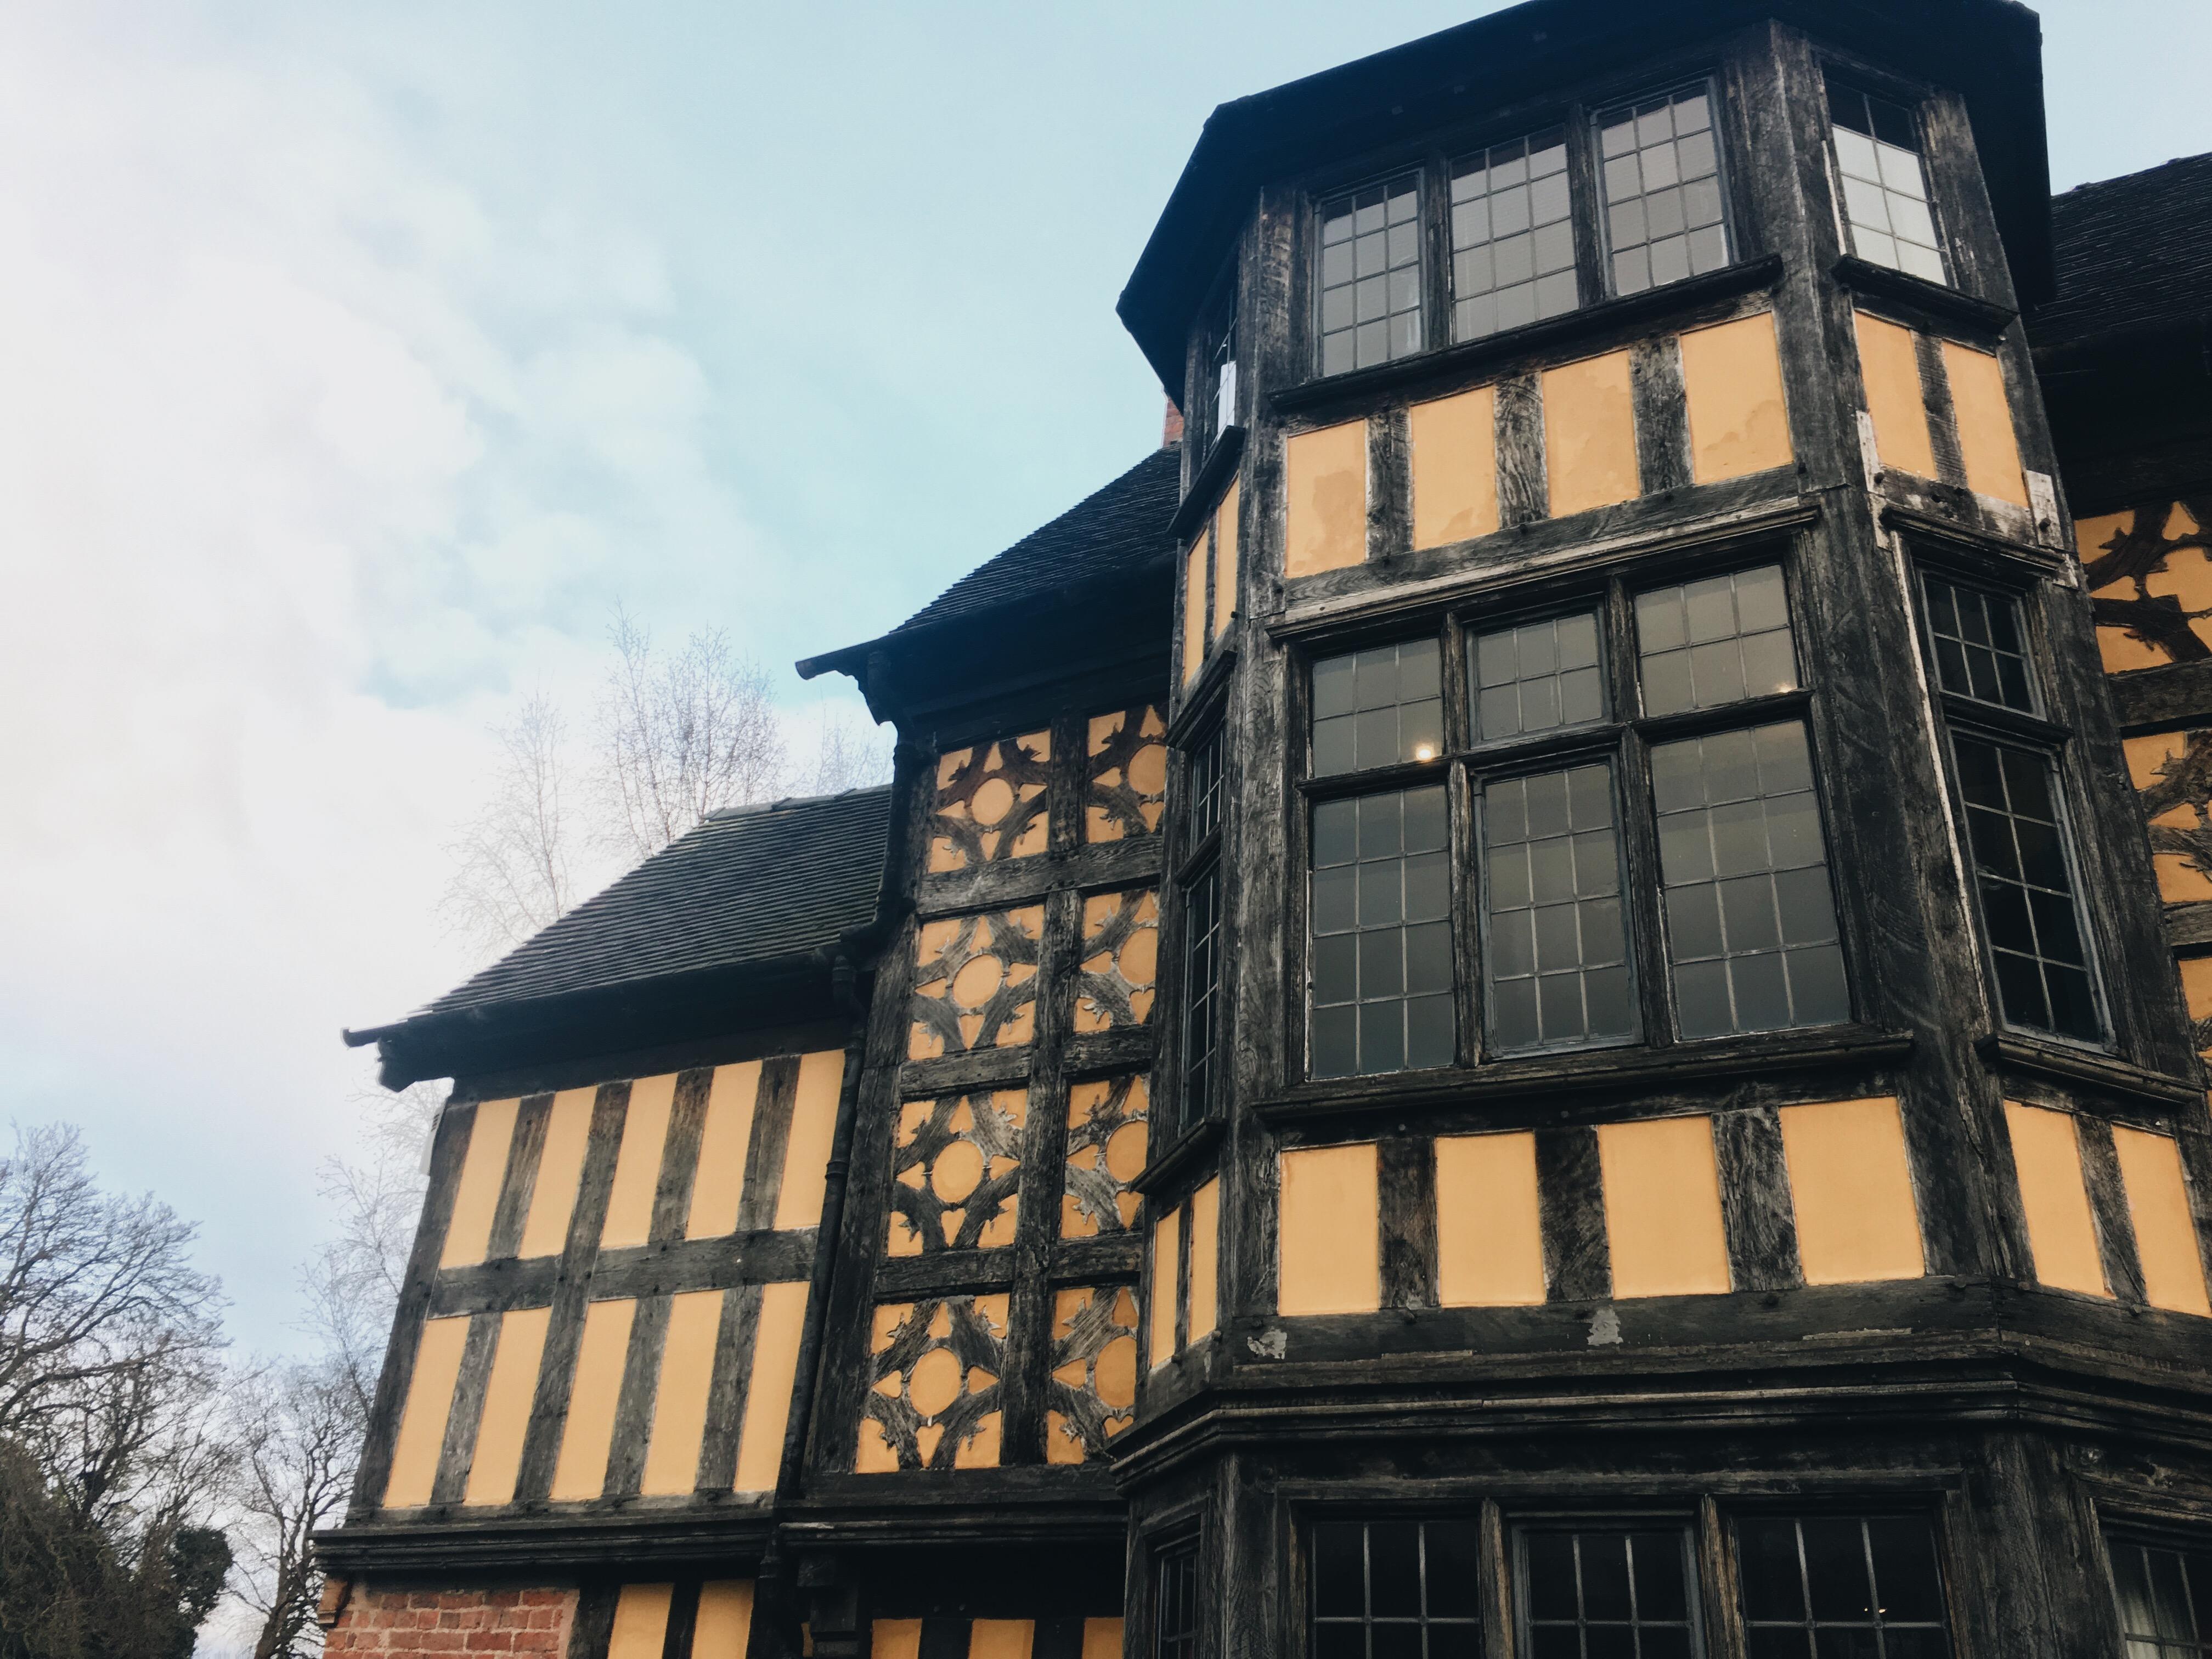 Architecture In Shrewsbury